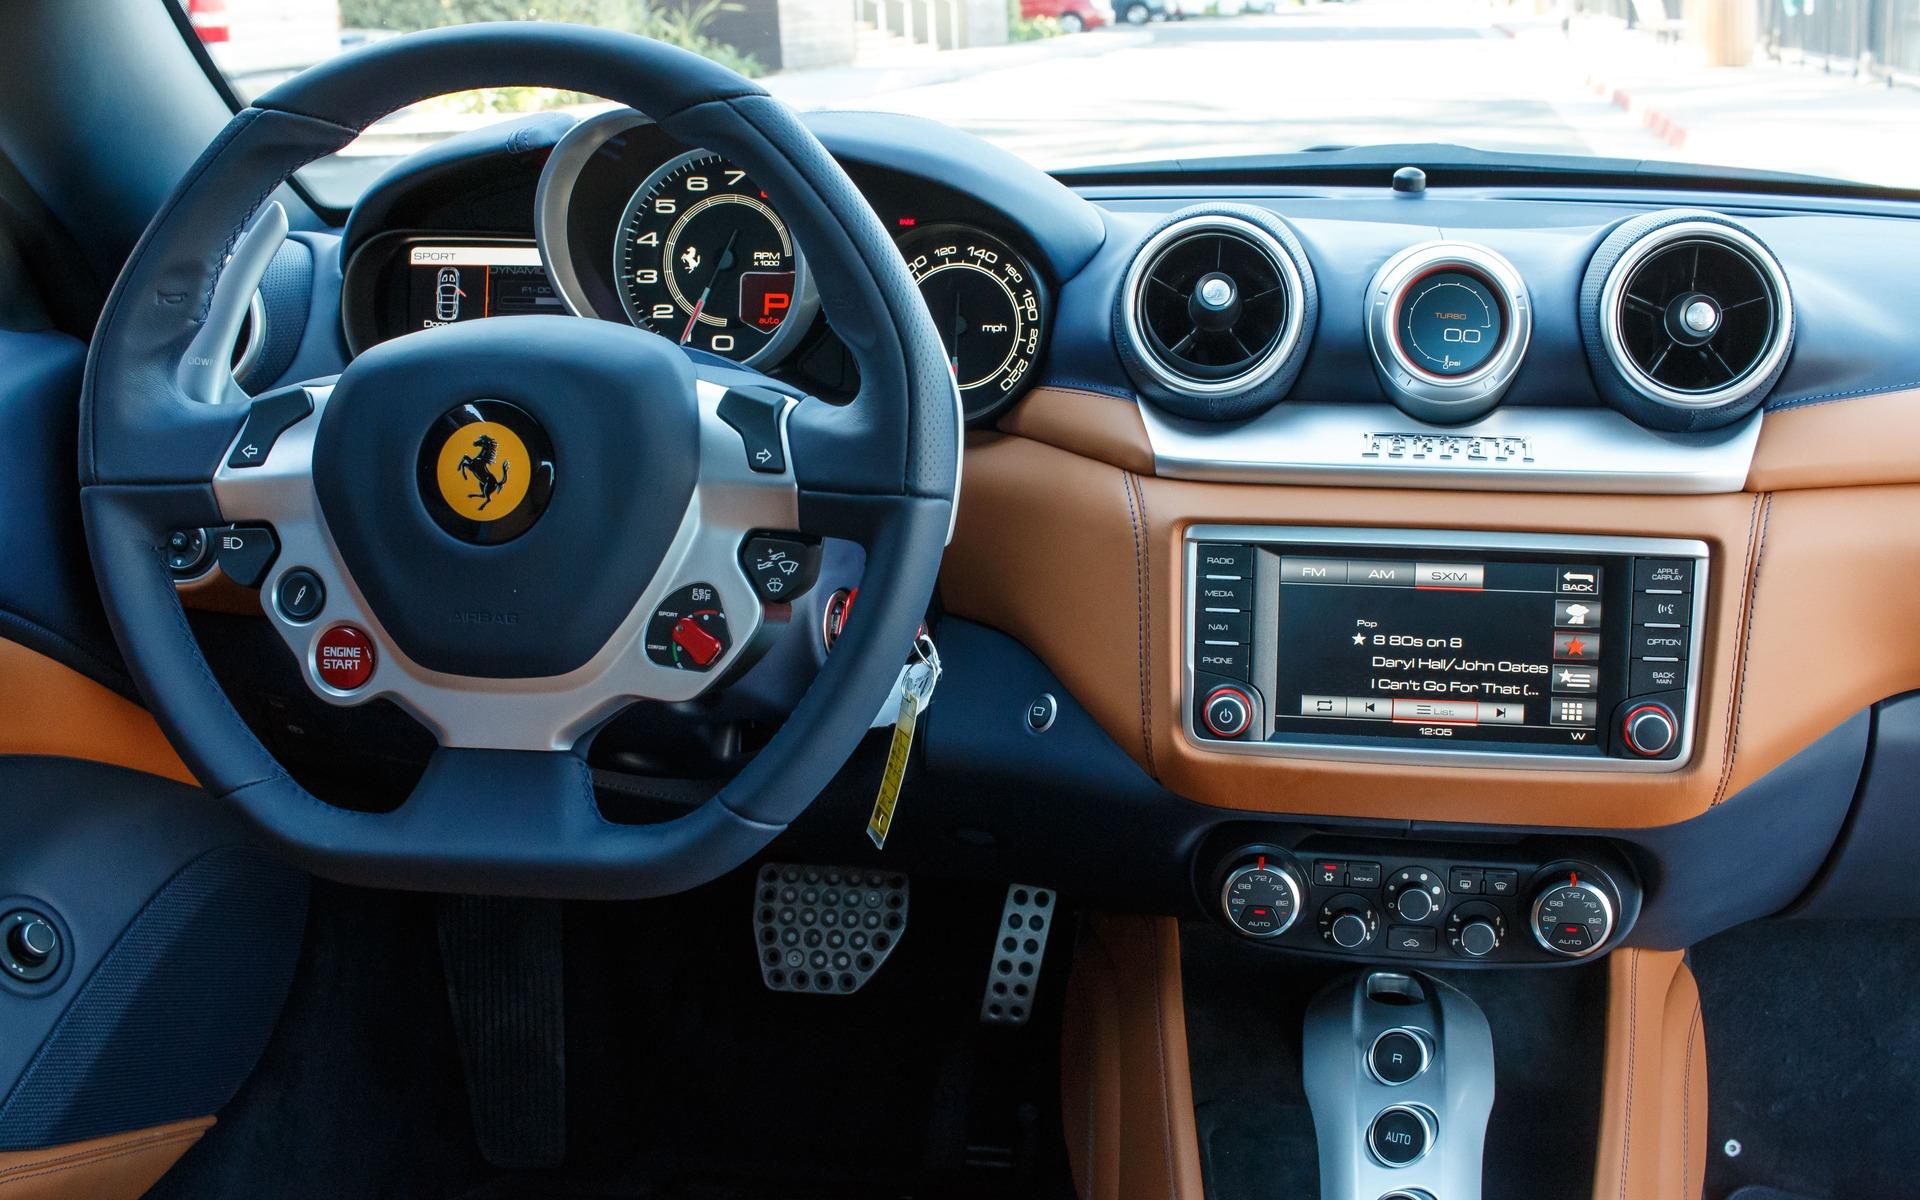 2017 Ferrari California photos - 3/7 - The Car Guide